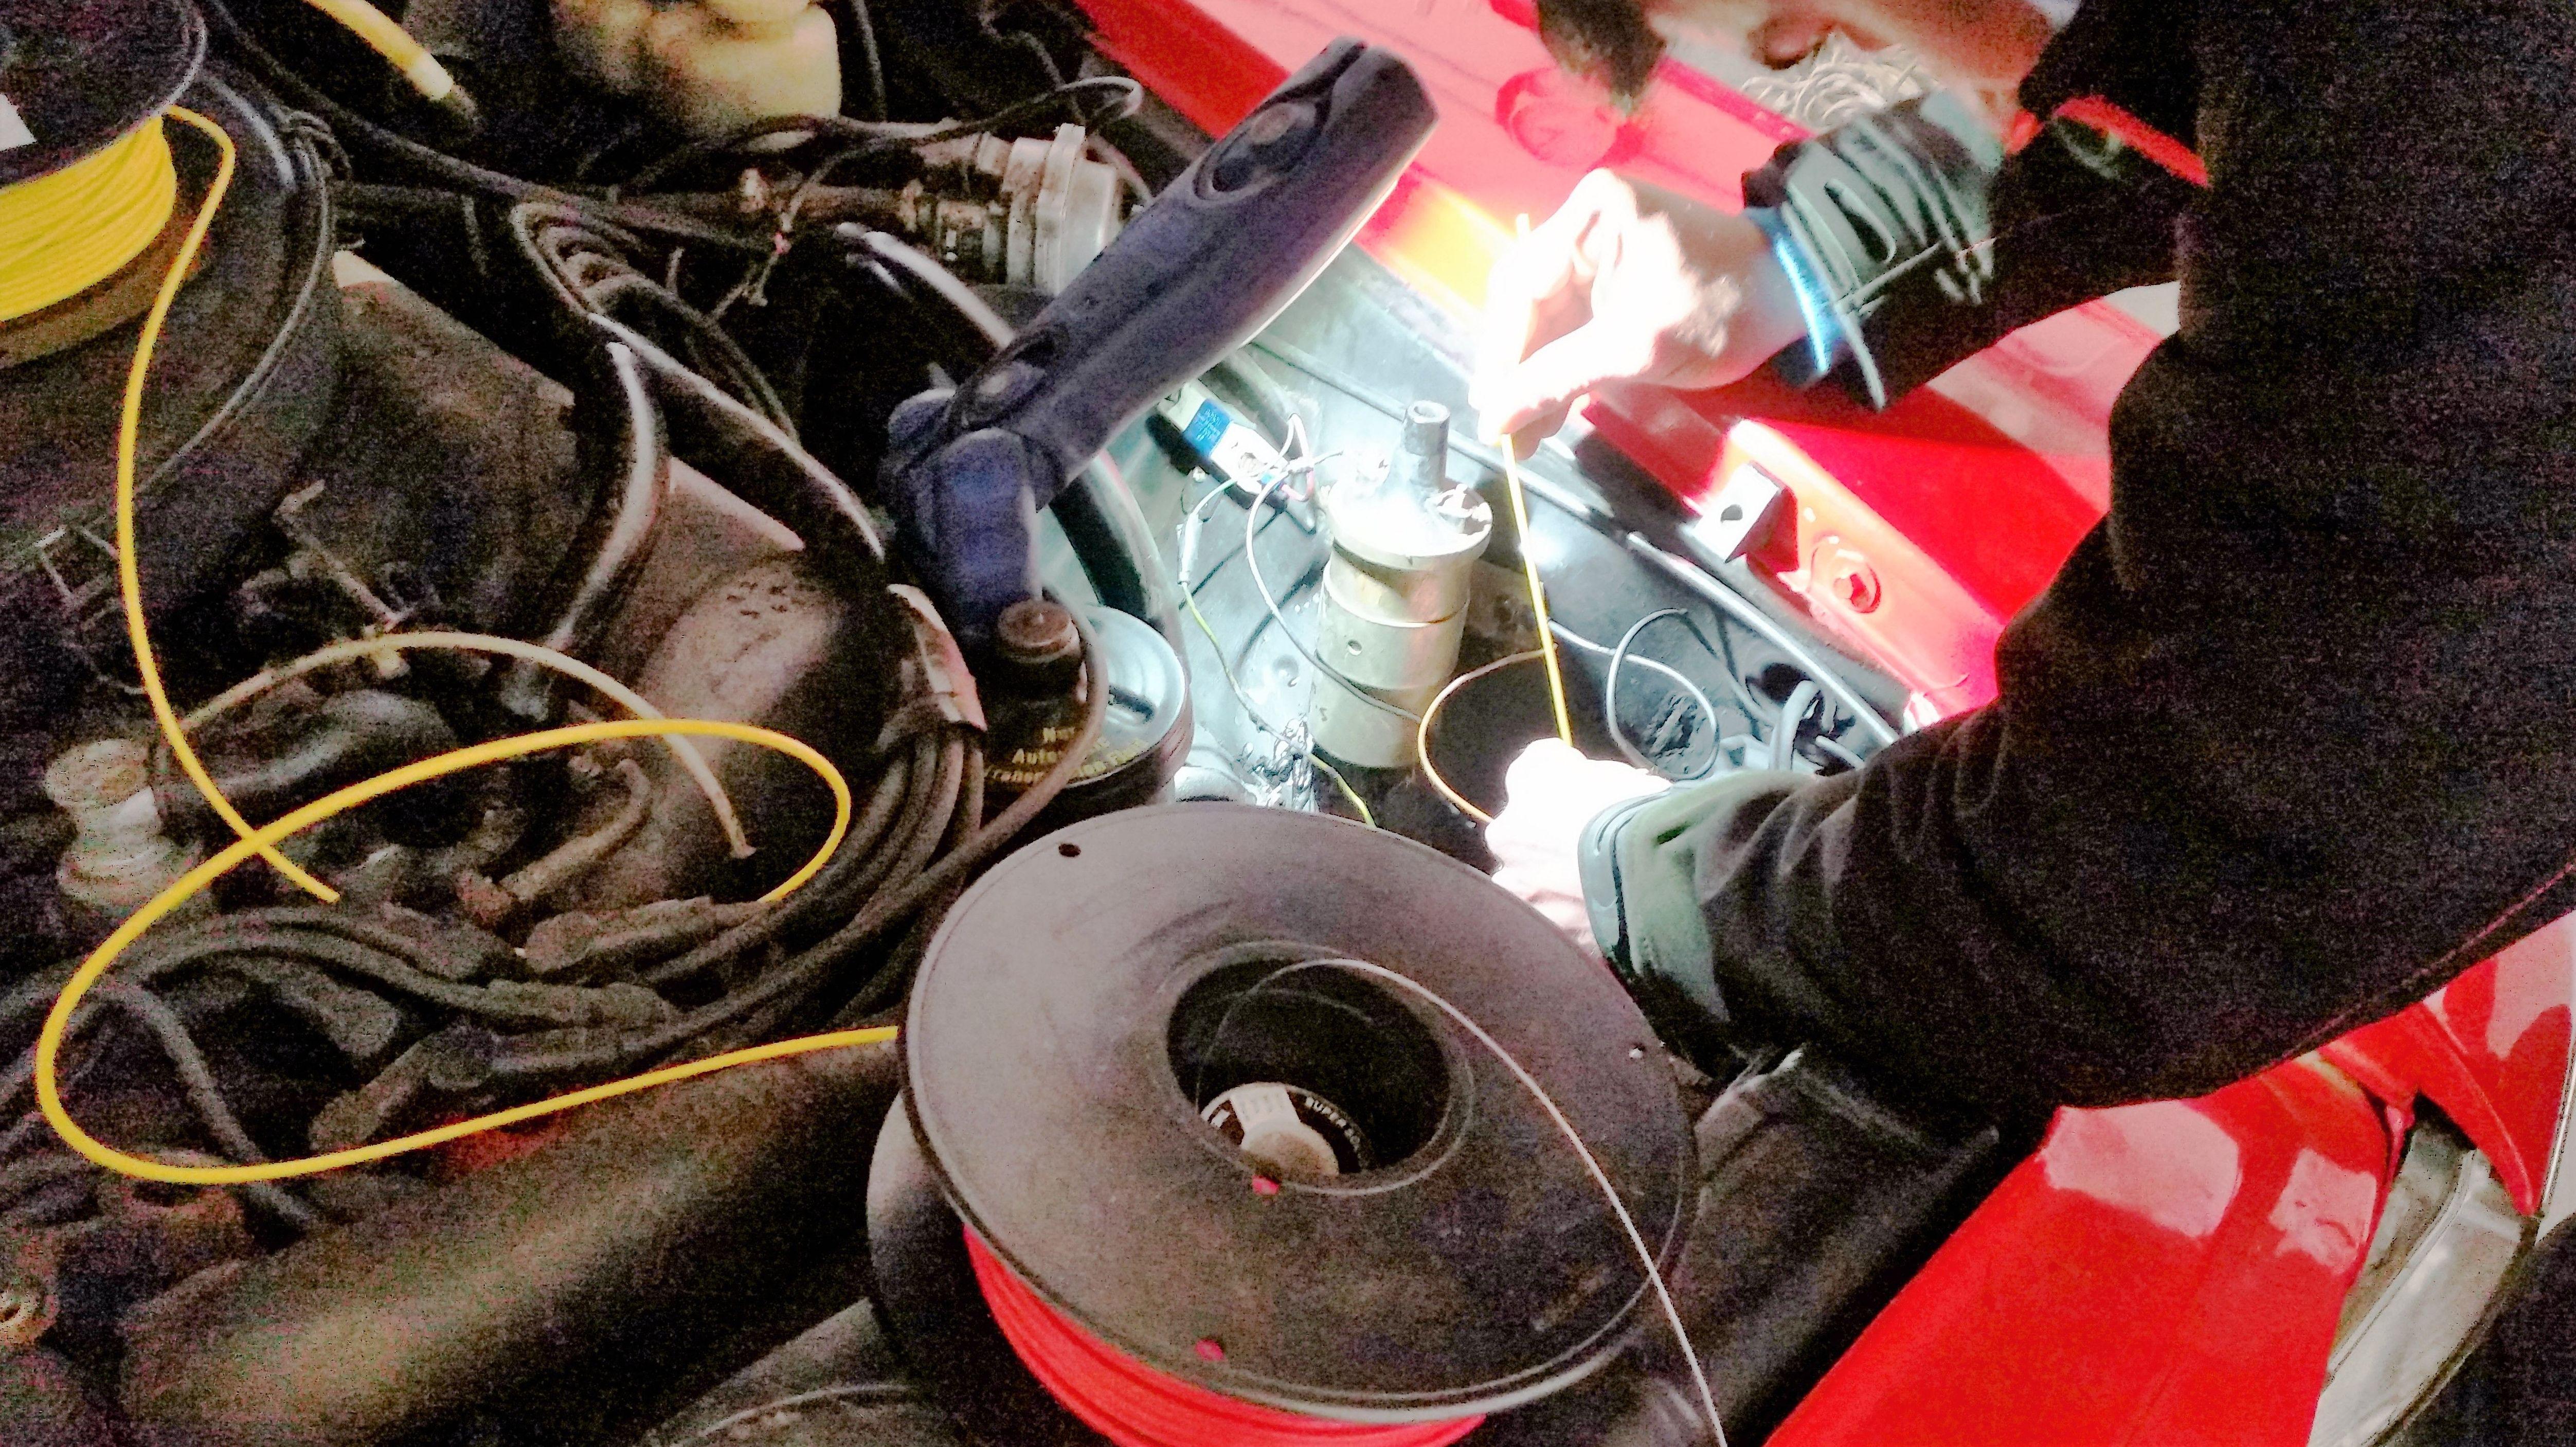 Reparando problema eléctrico